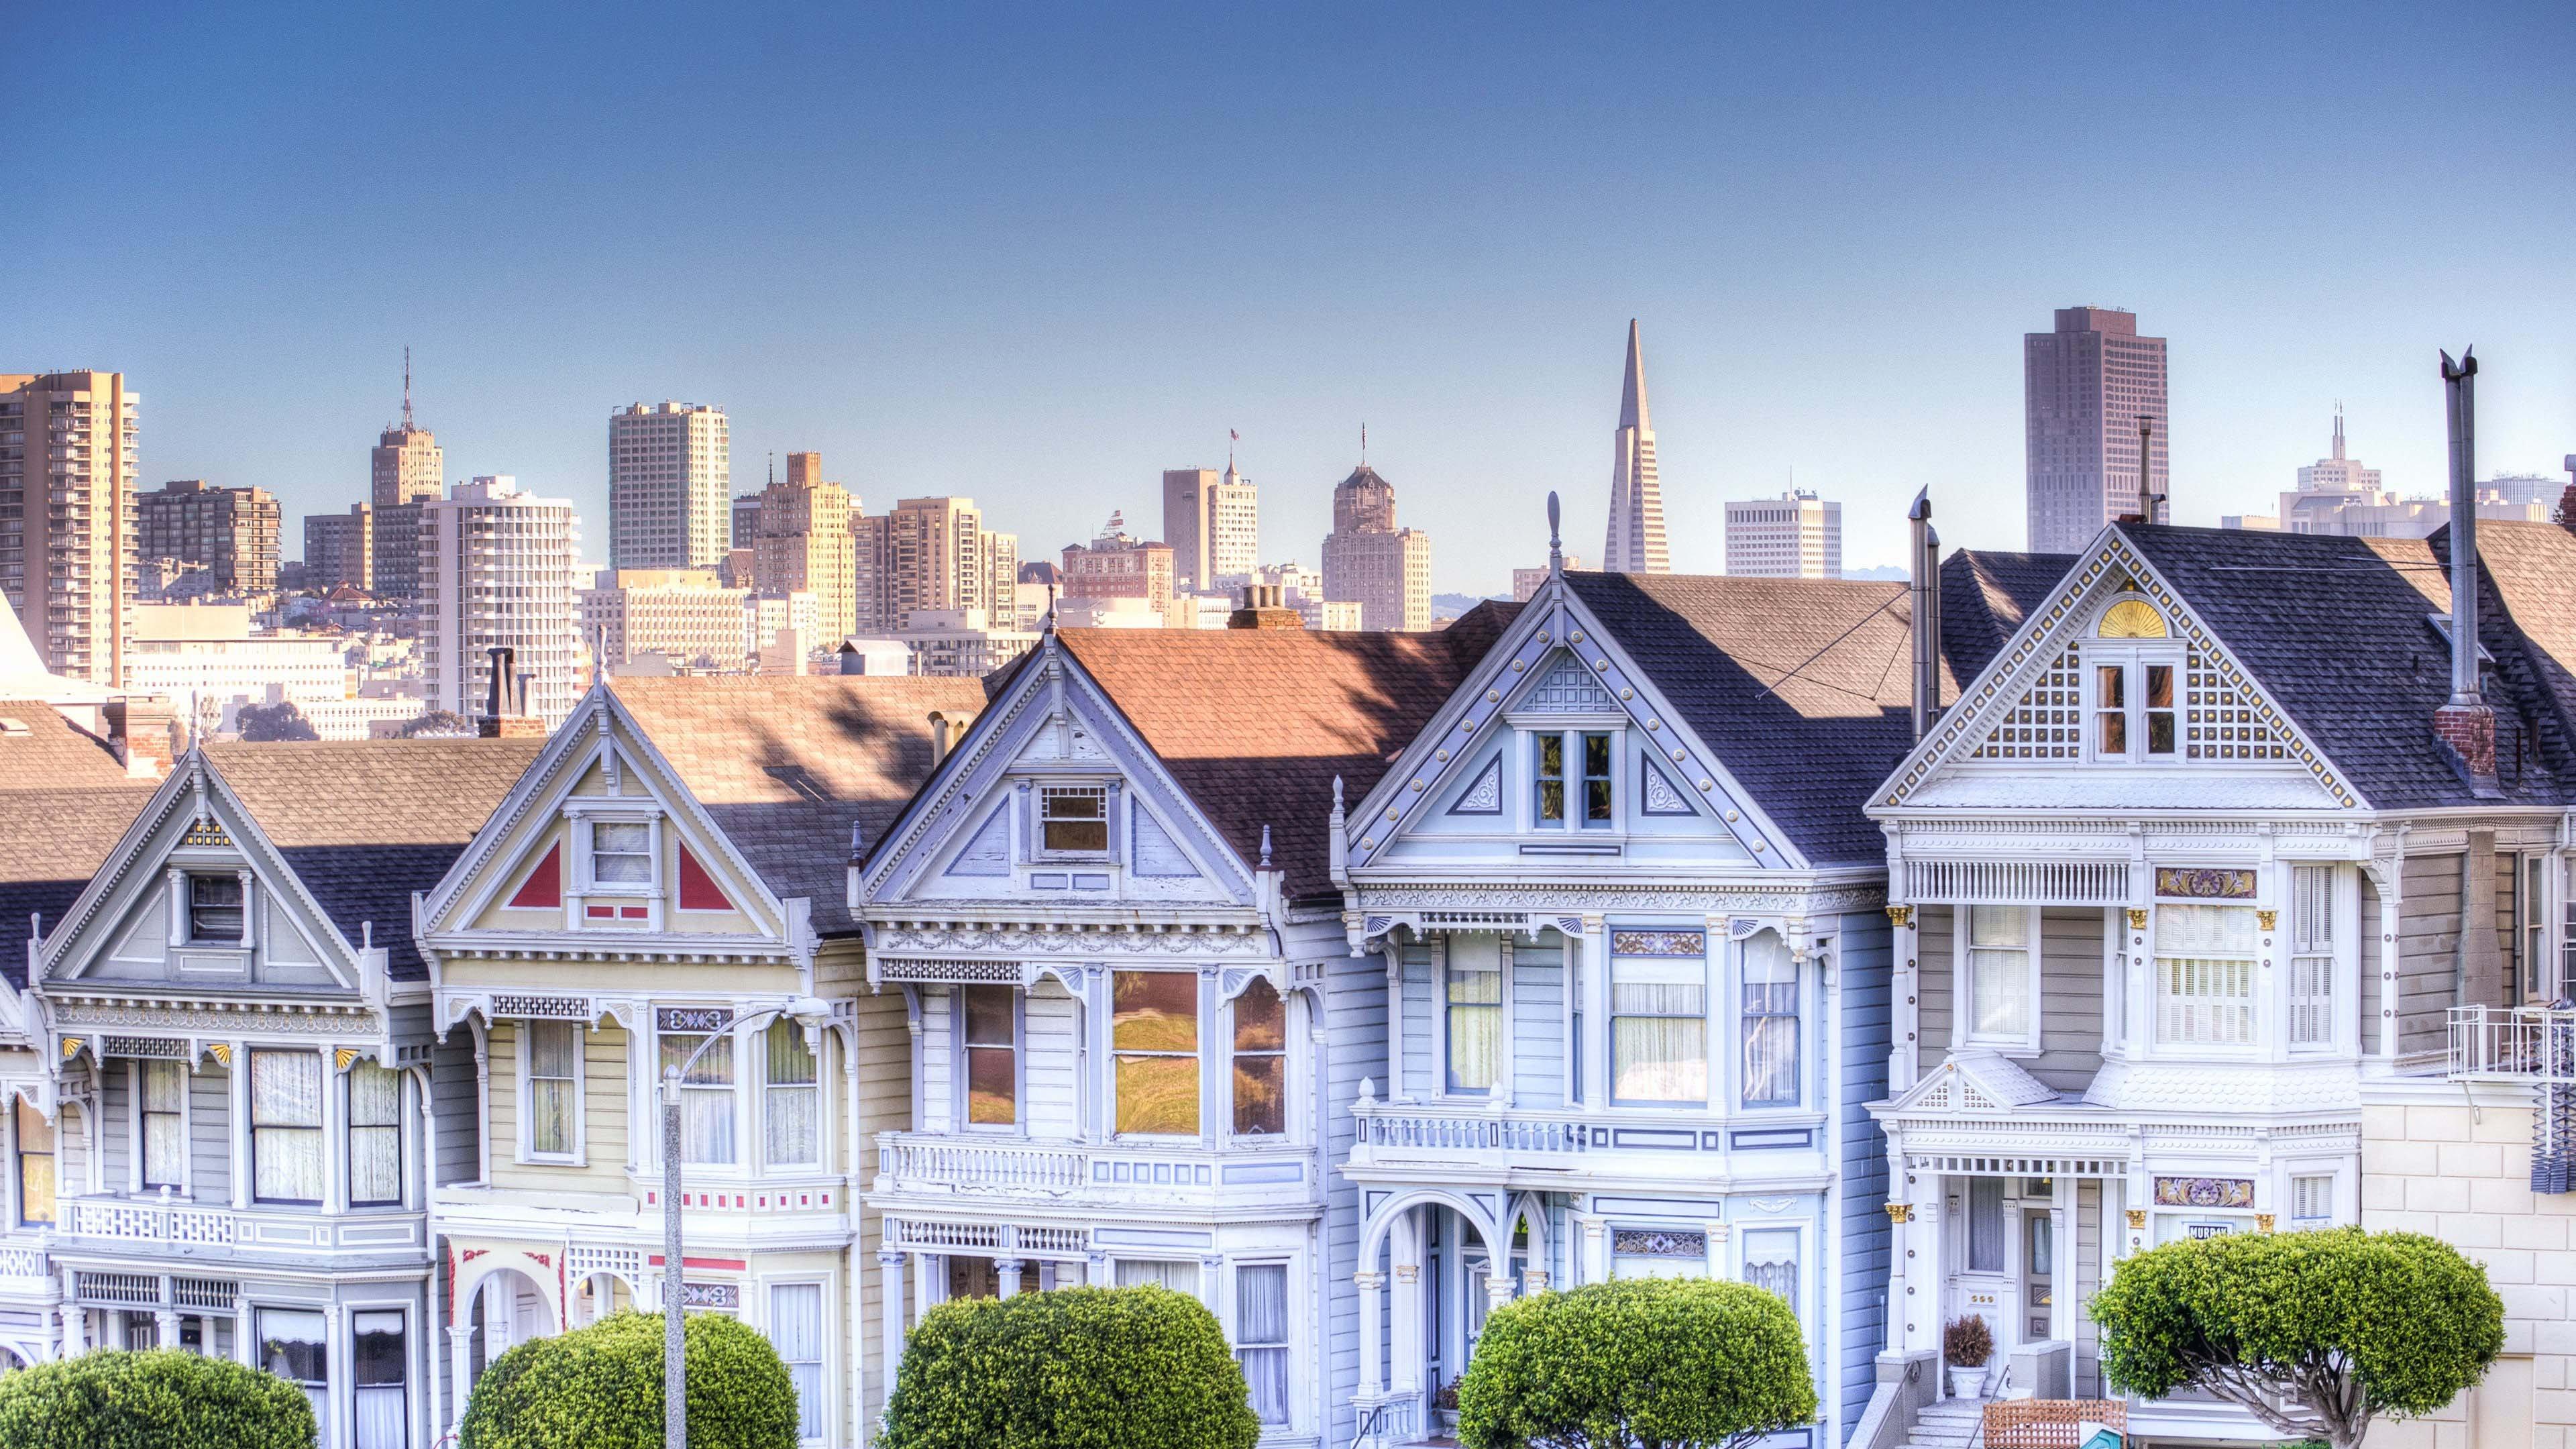 San Francisco HD wallpaper